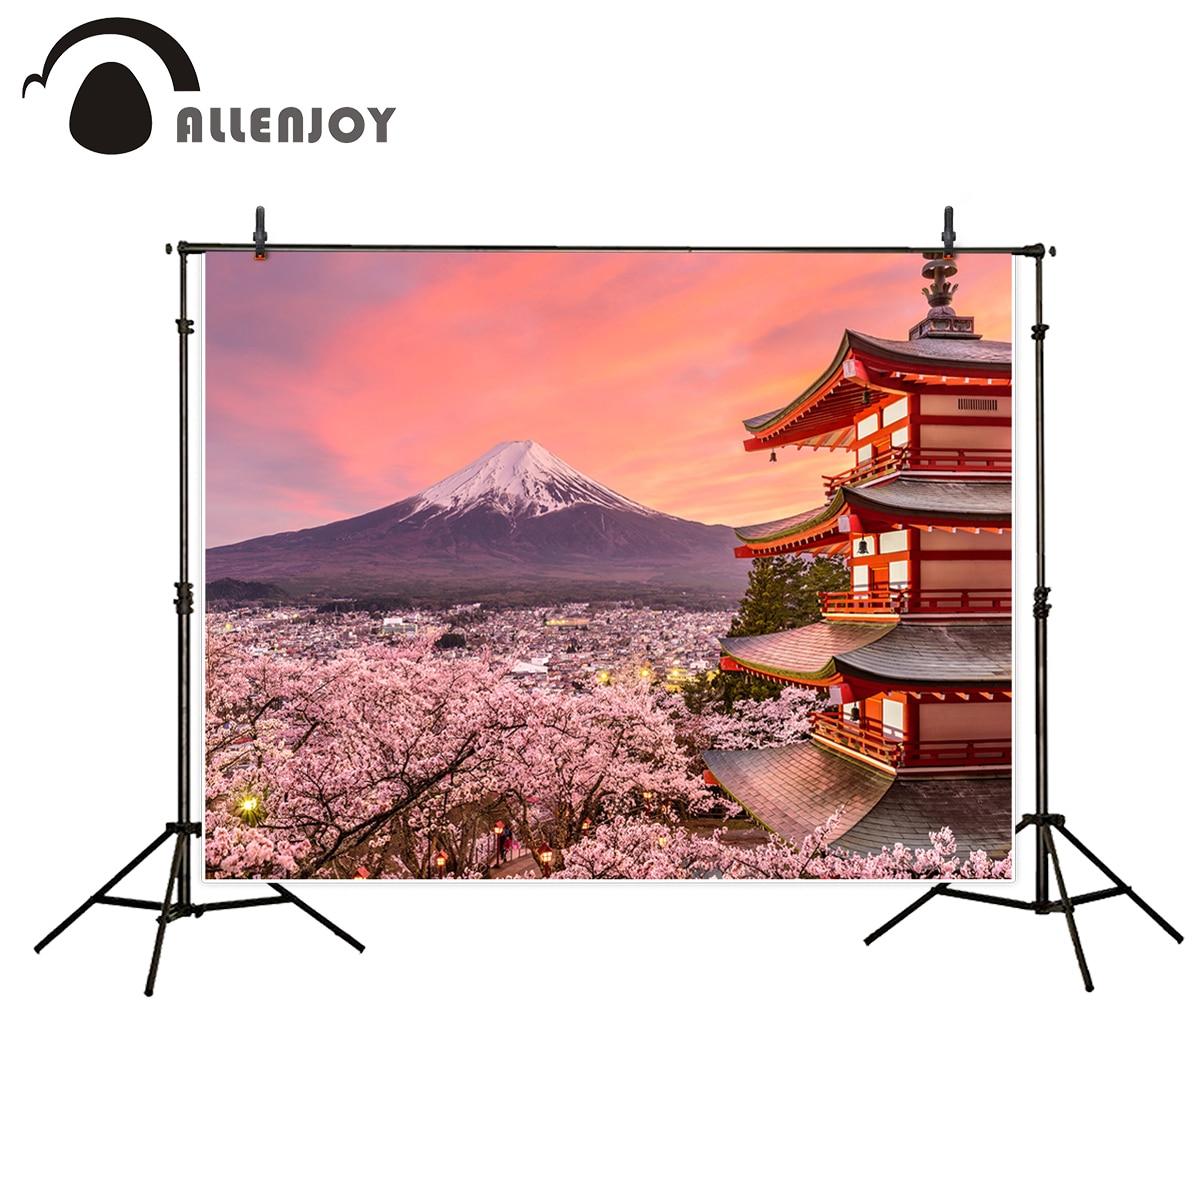 Allenjoy photography background Mount Fuji Architecture sakura snow mountain Japanese style sunset Natural Scenery backdrop kate background natural scenery